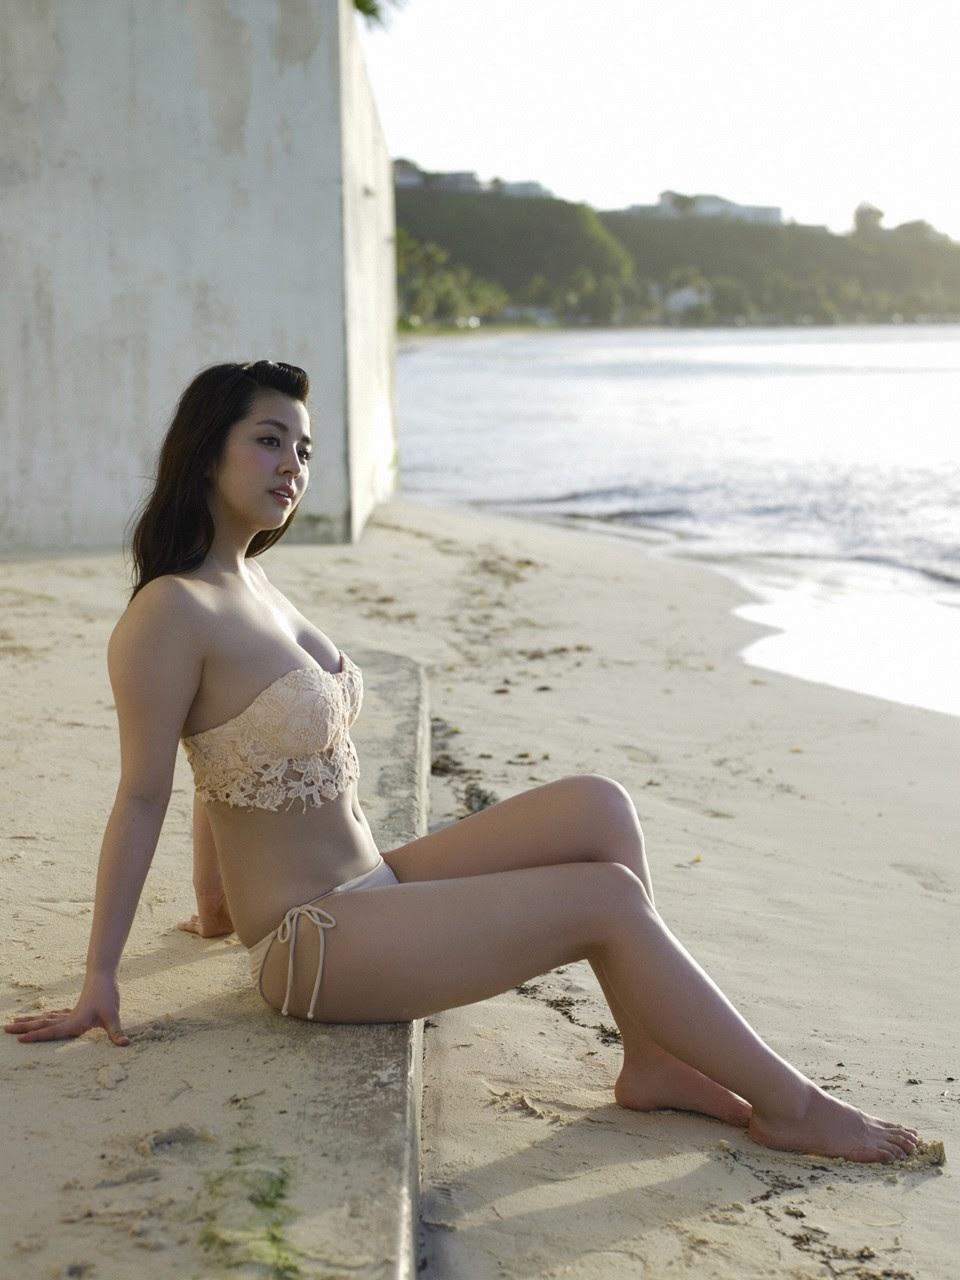 Bikini on a white sandy beach063